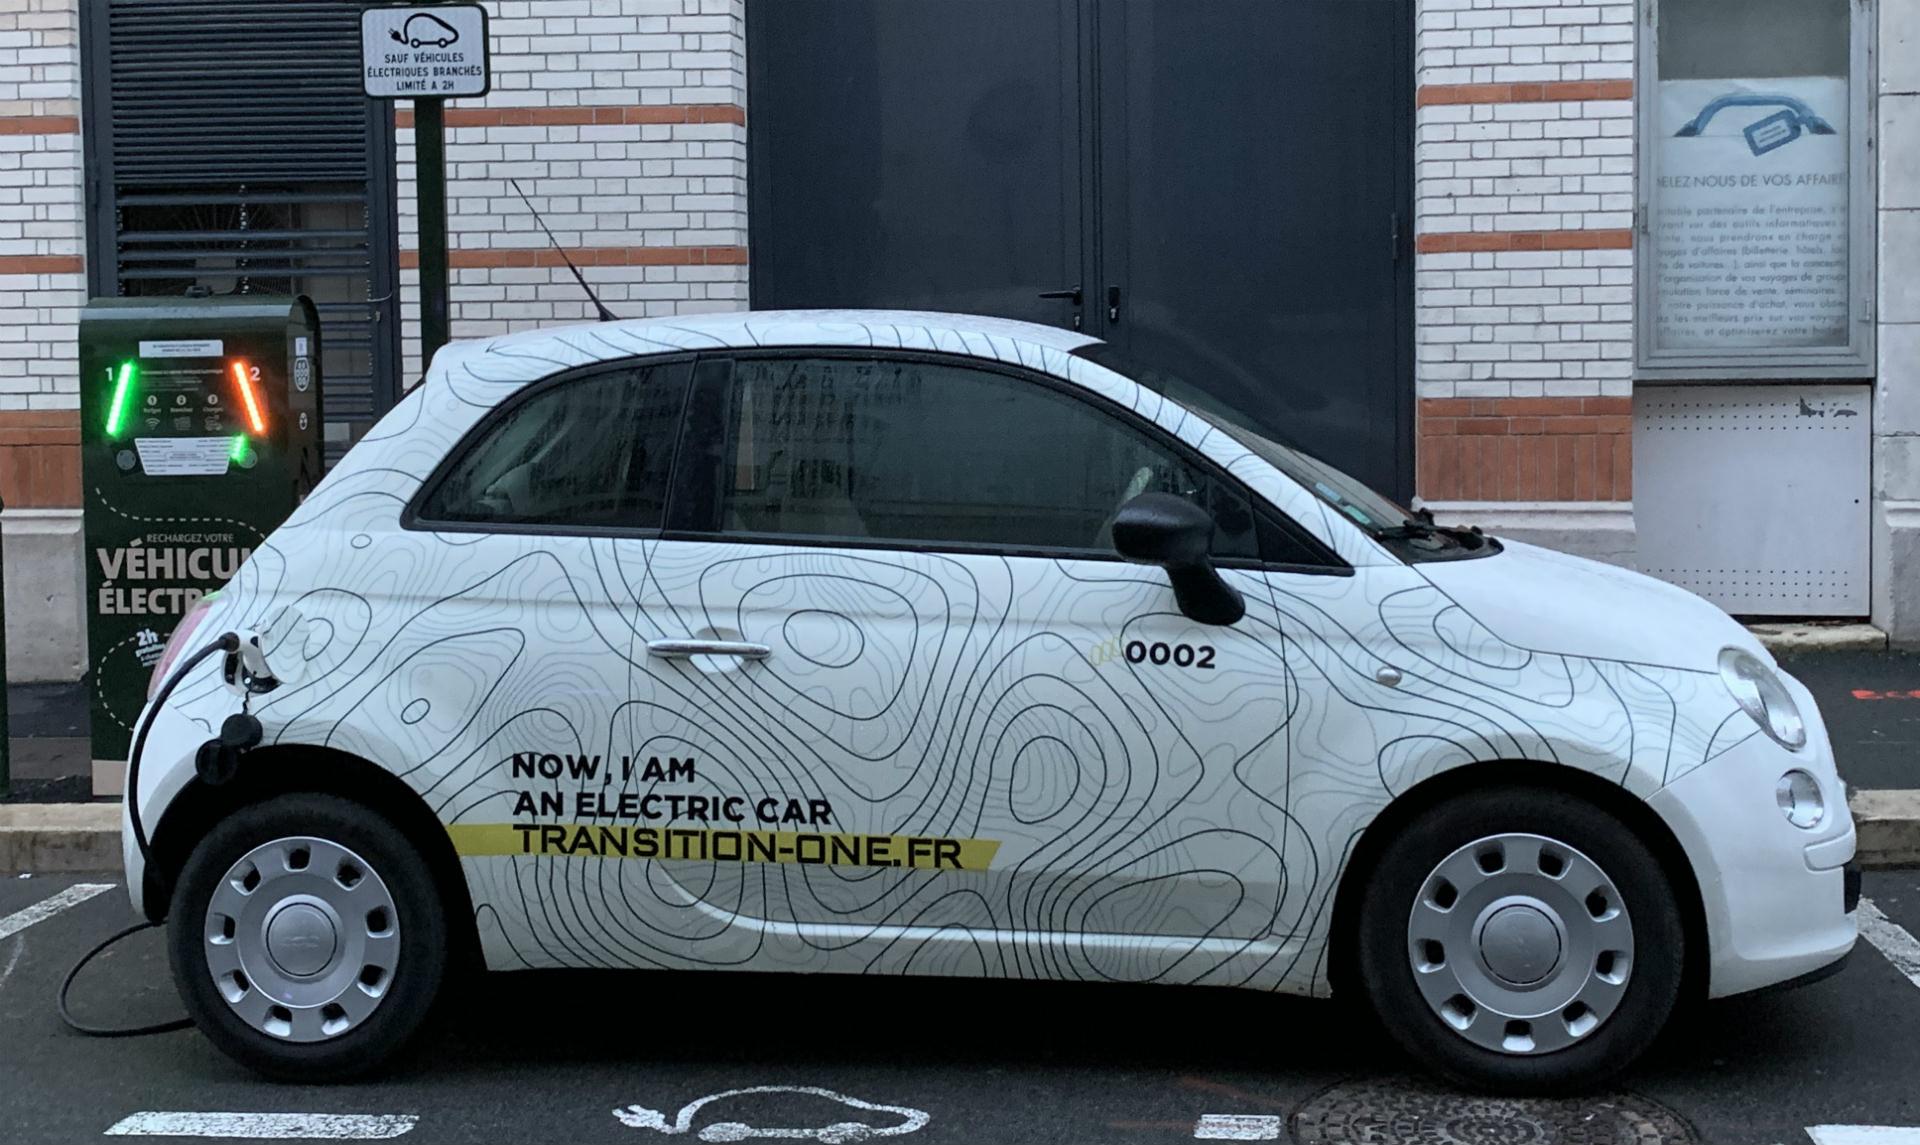 Gallery Transition-One Car Retrofit Technology 3